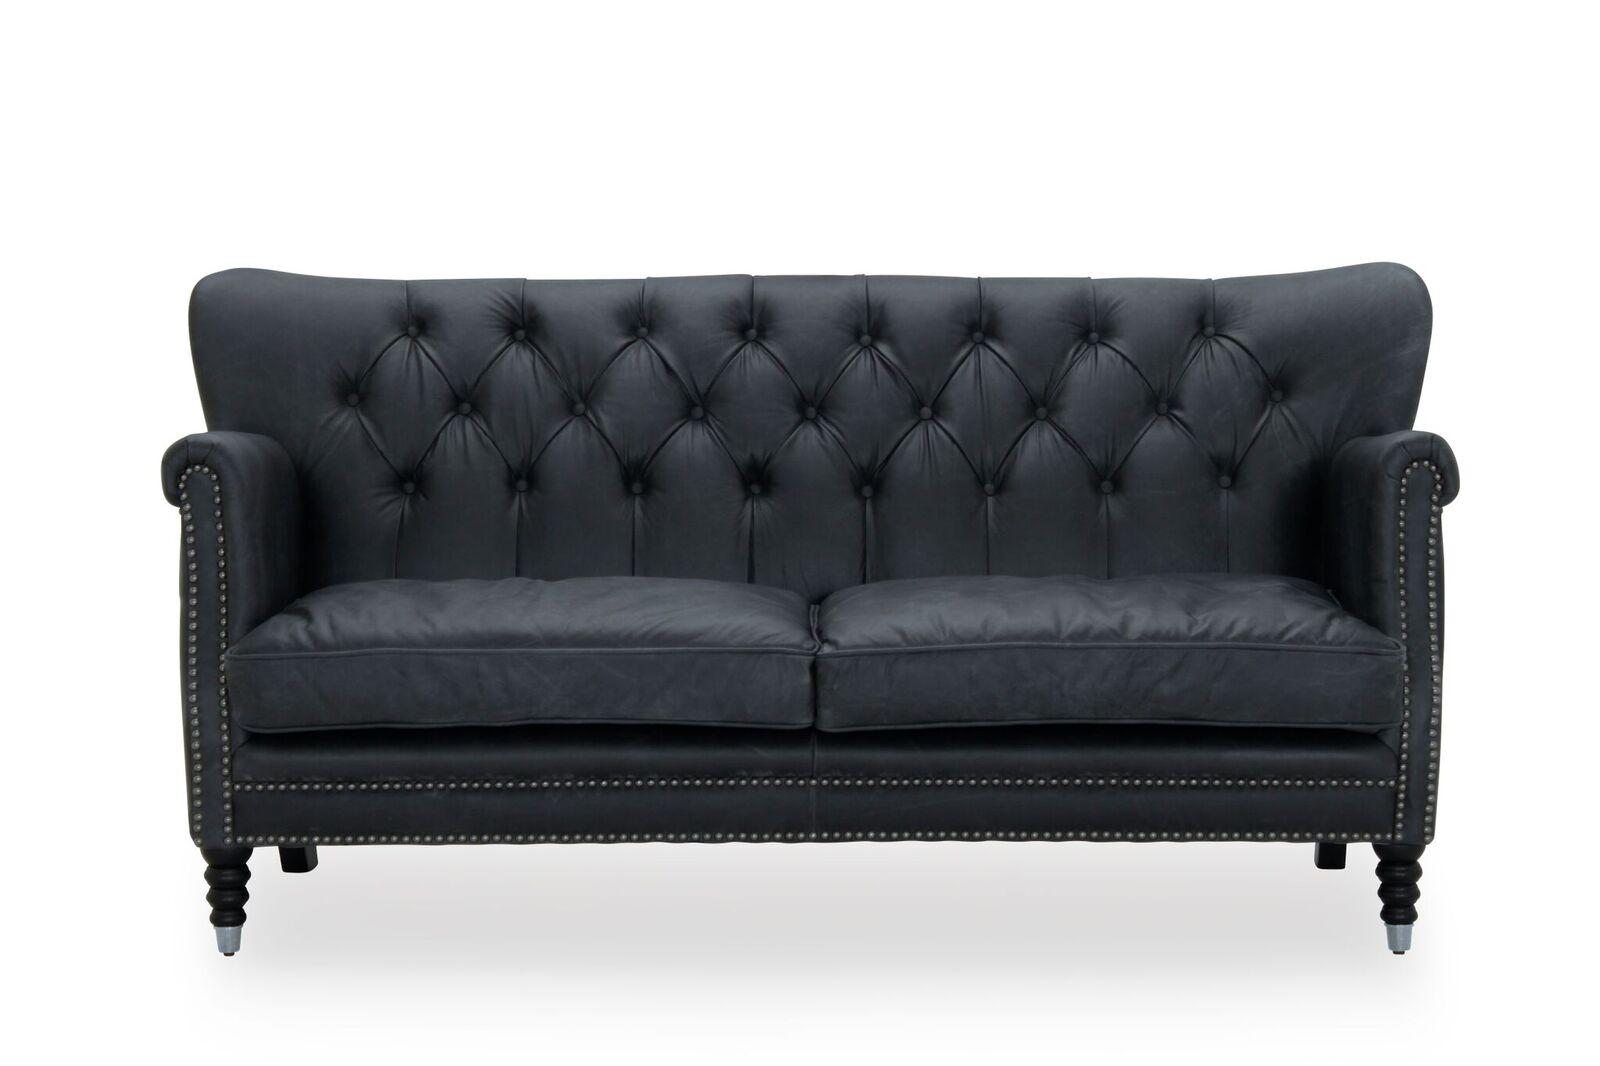 HAGA Glasgow 2,5 pers. sofa - sort læder PU